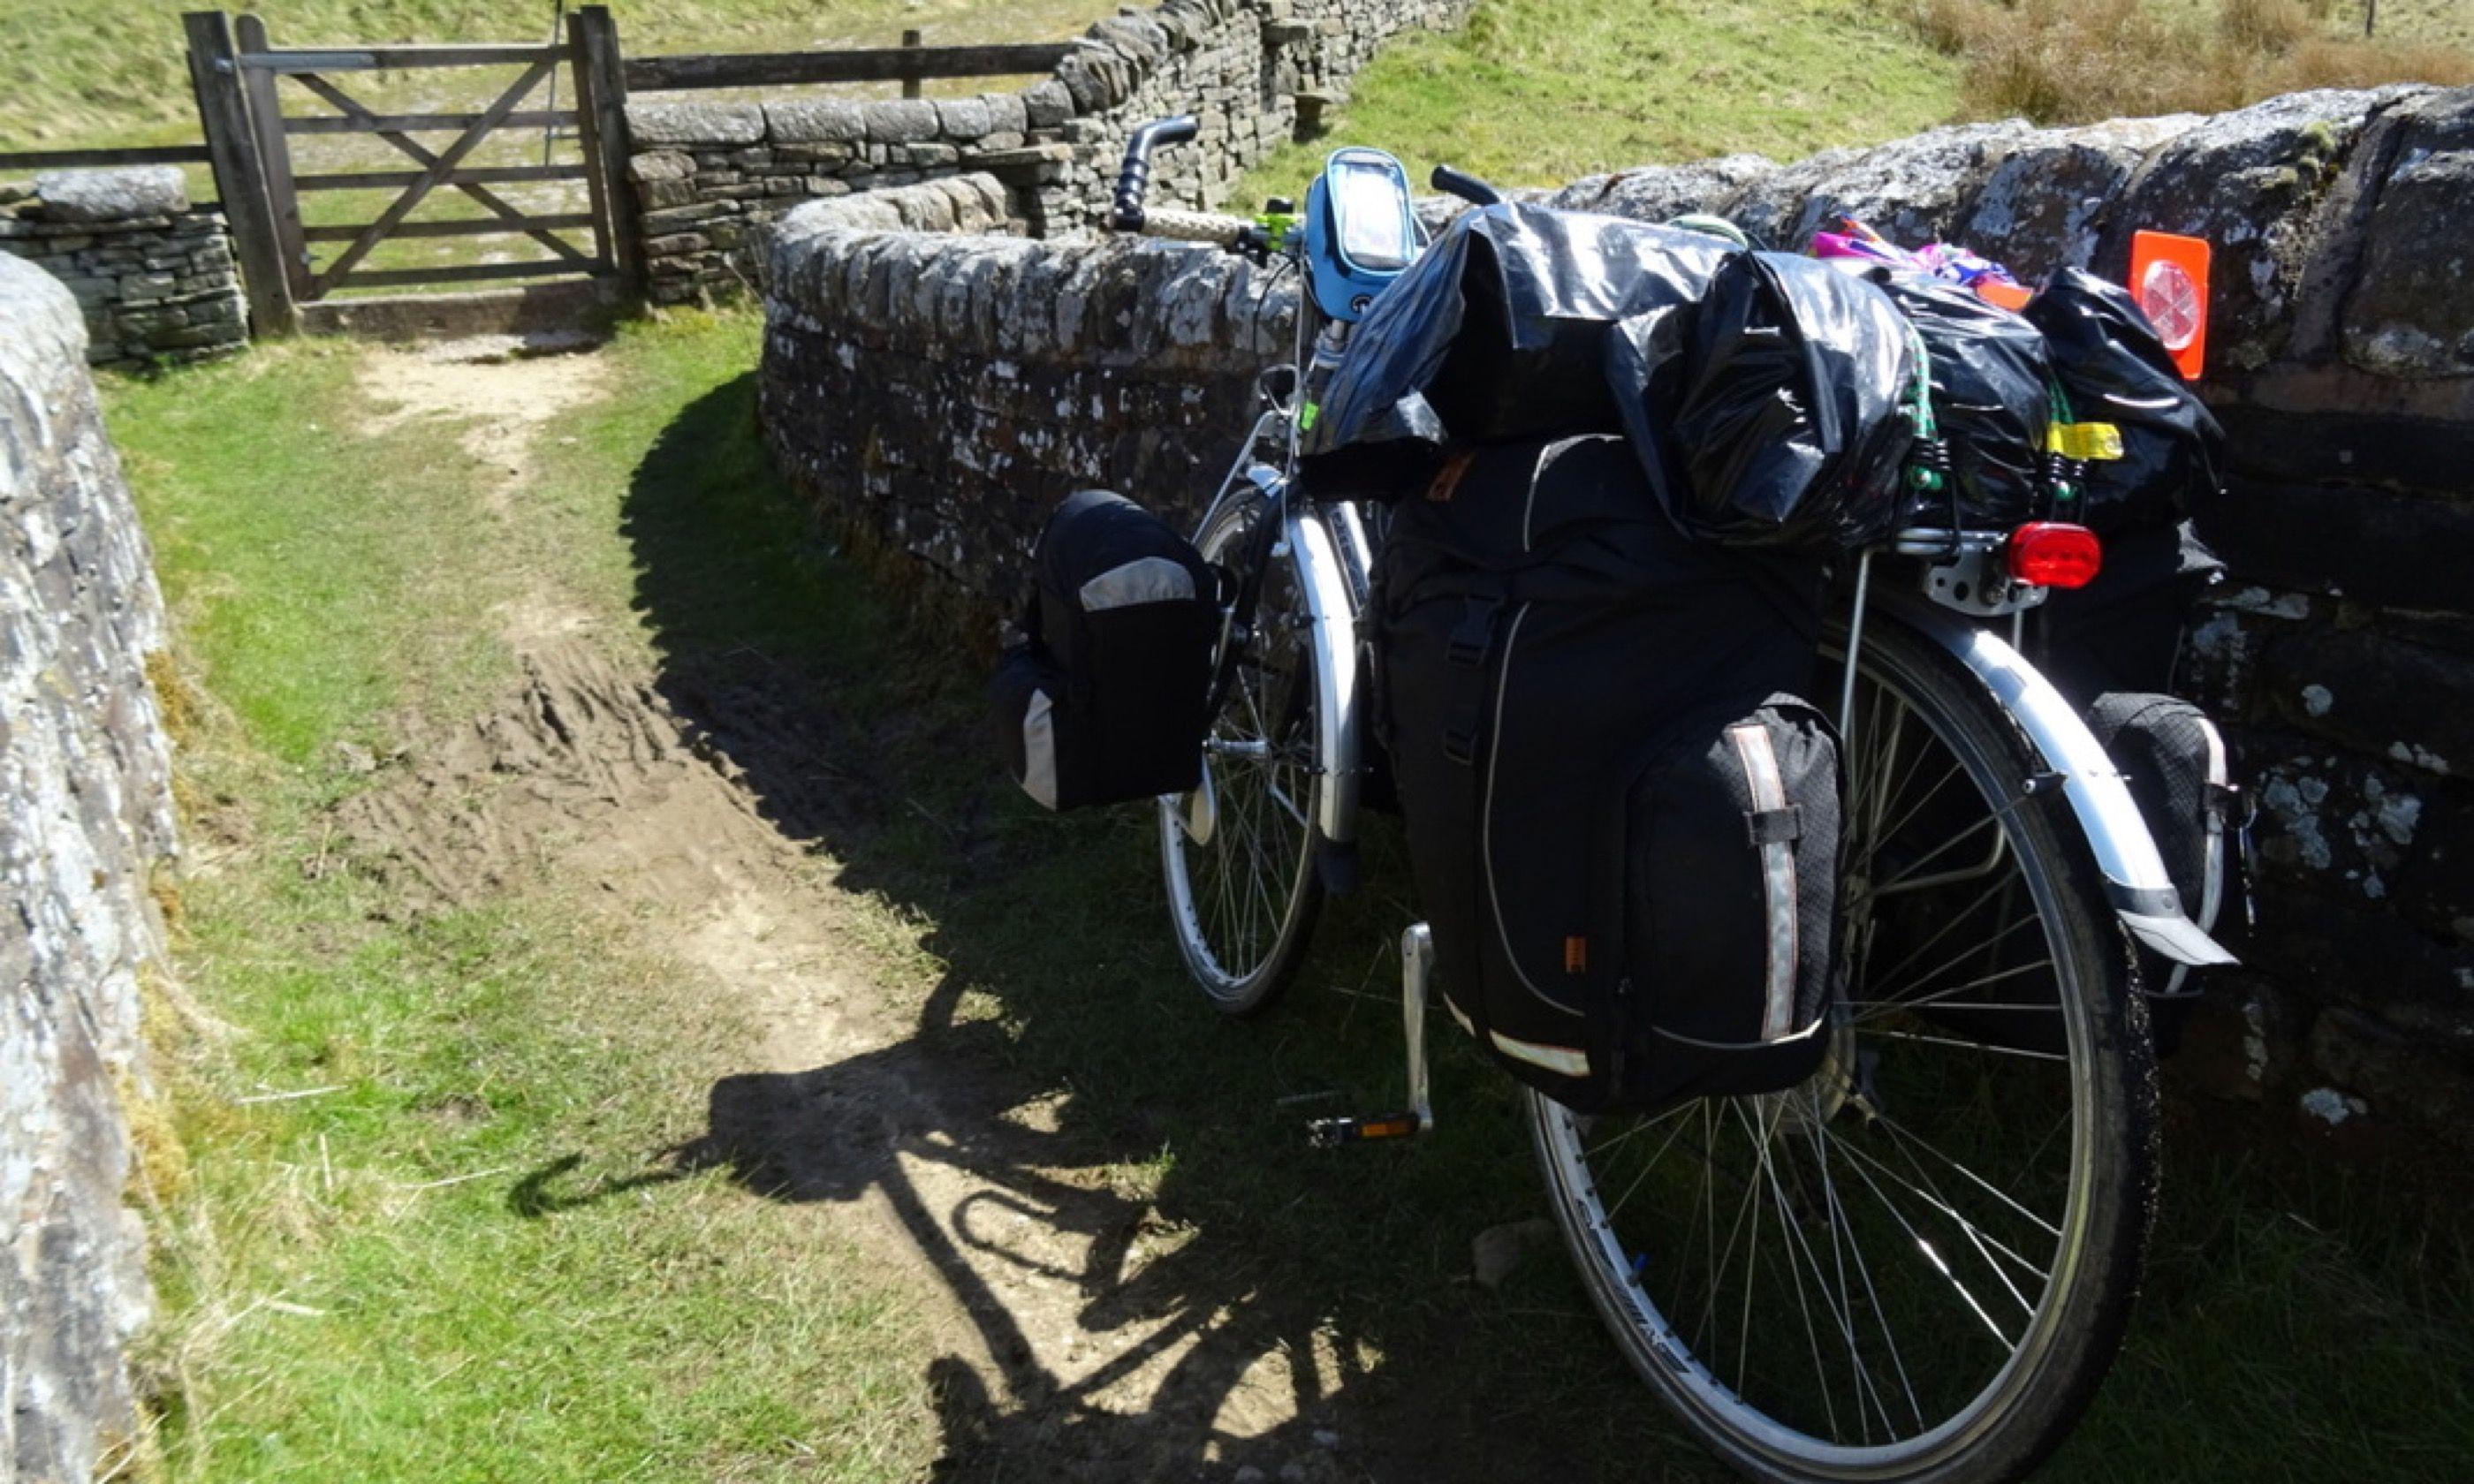 Stone wall cycling (Rowan sisters)